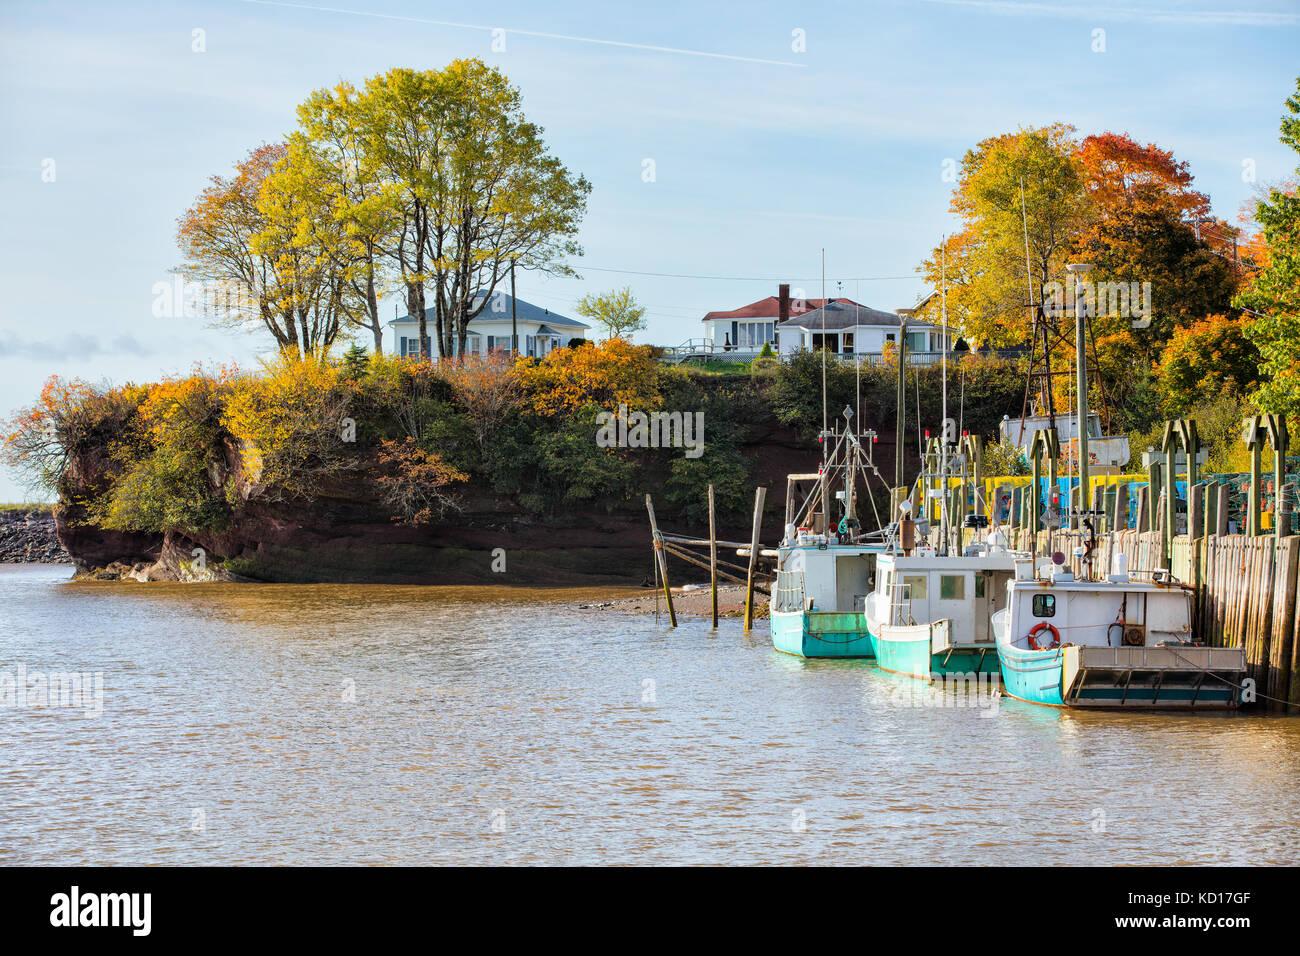 Fishing boats tied up at wharf, St. Martins, Bay of Fundy, New Brunswick, Canada - Stock Image